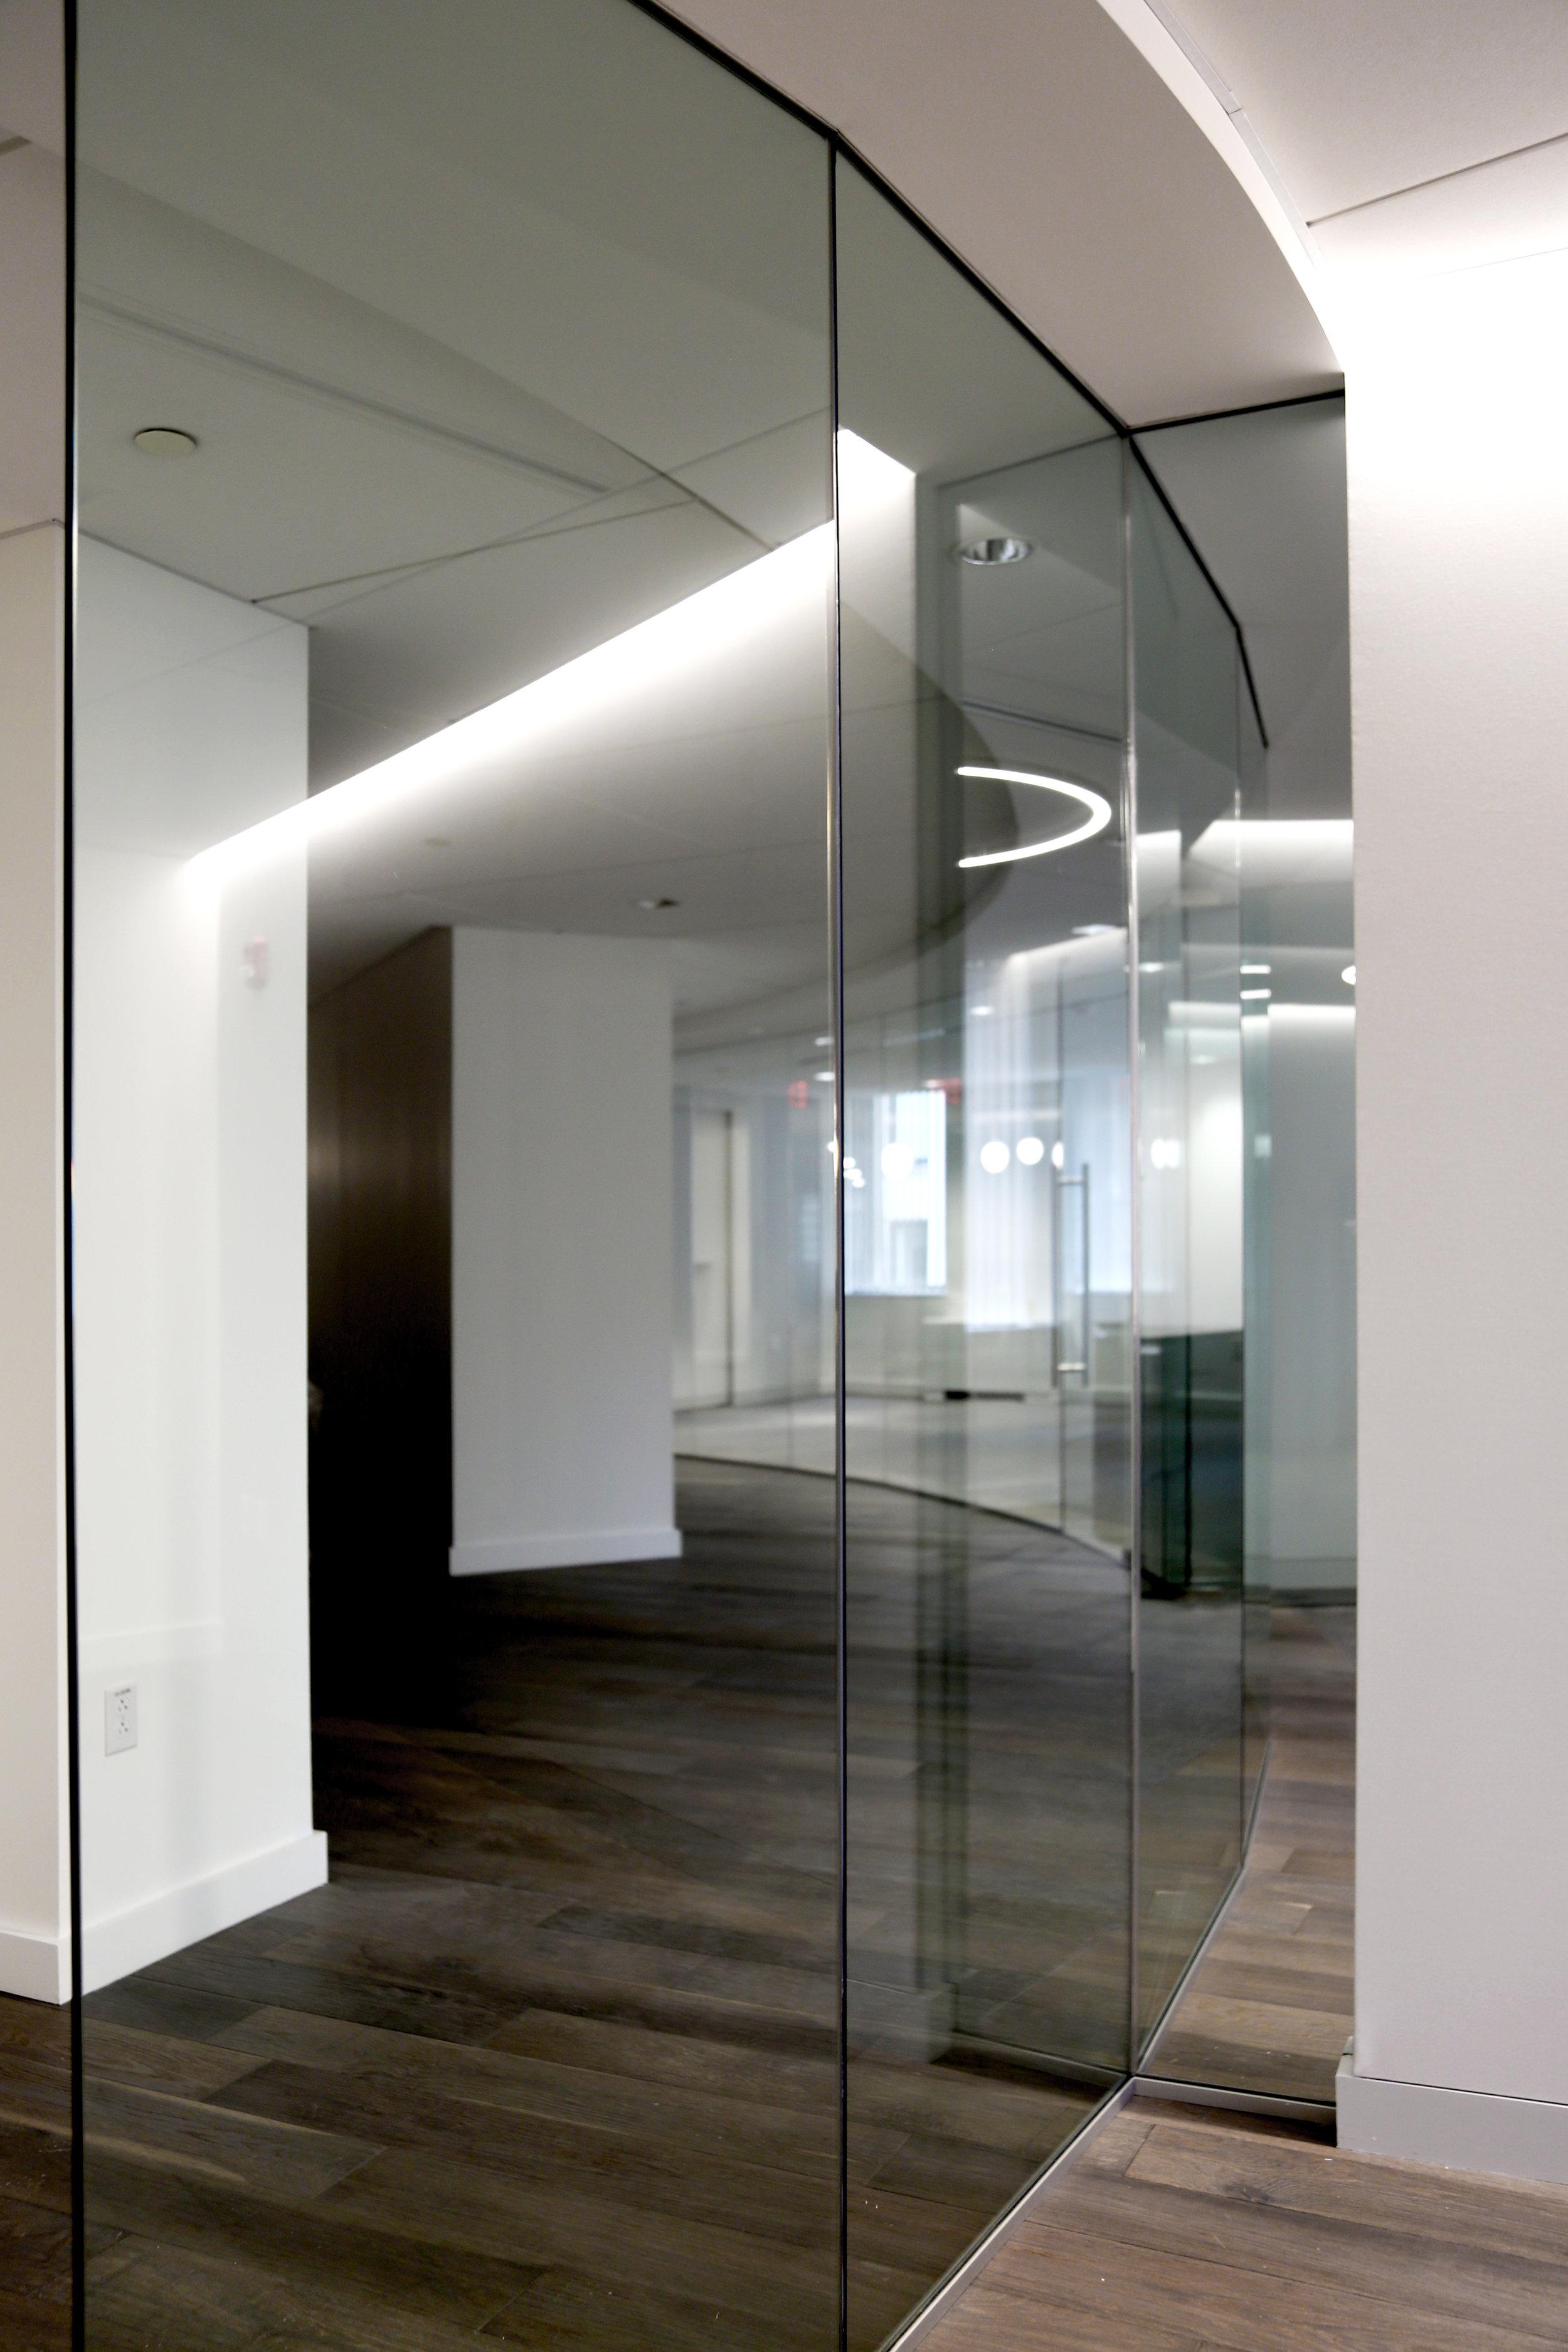 Illume Frameless Glass Wall Curved - Spaceworks AI.jpg